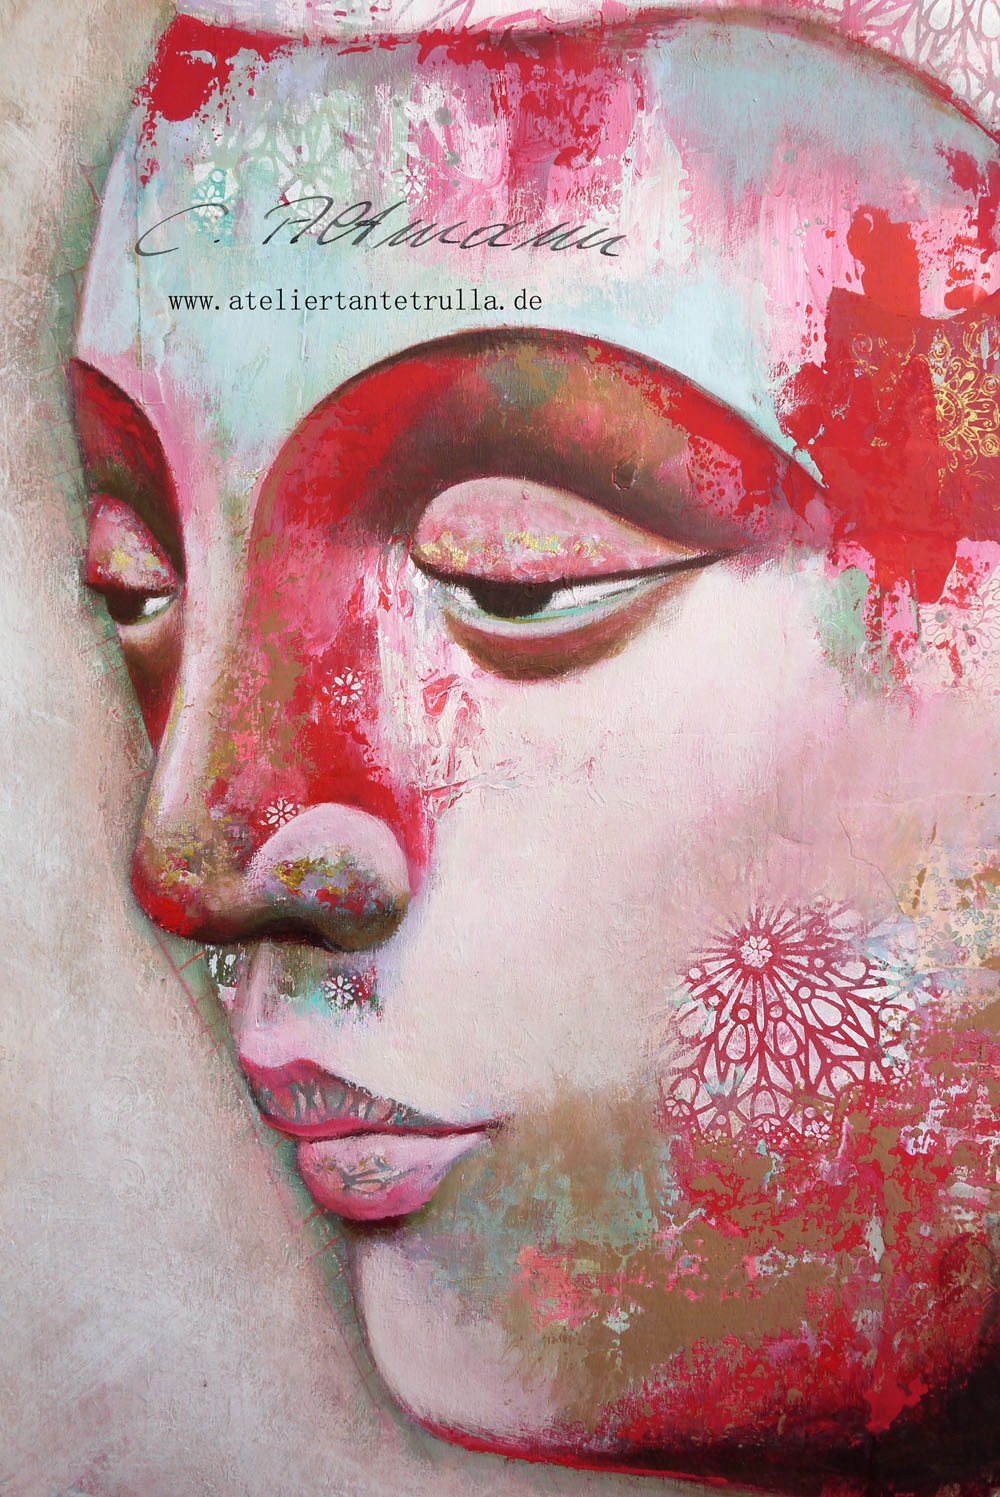 buddha painting by Conni Altmann, www.ateliertantetrulla.de